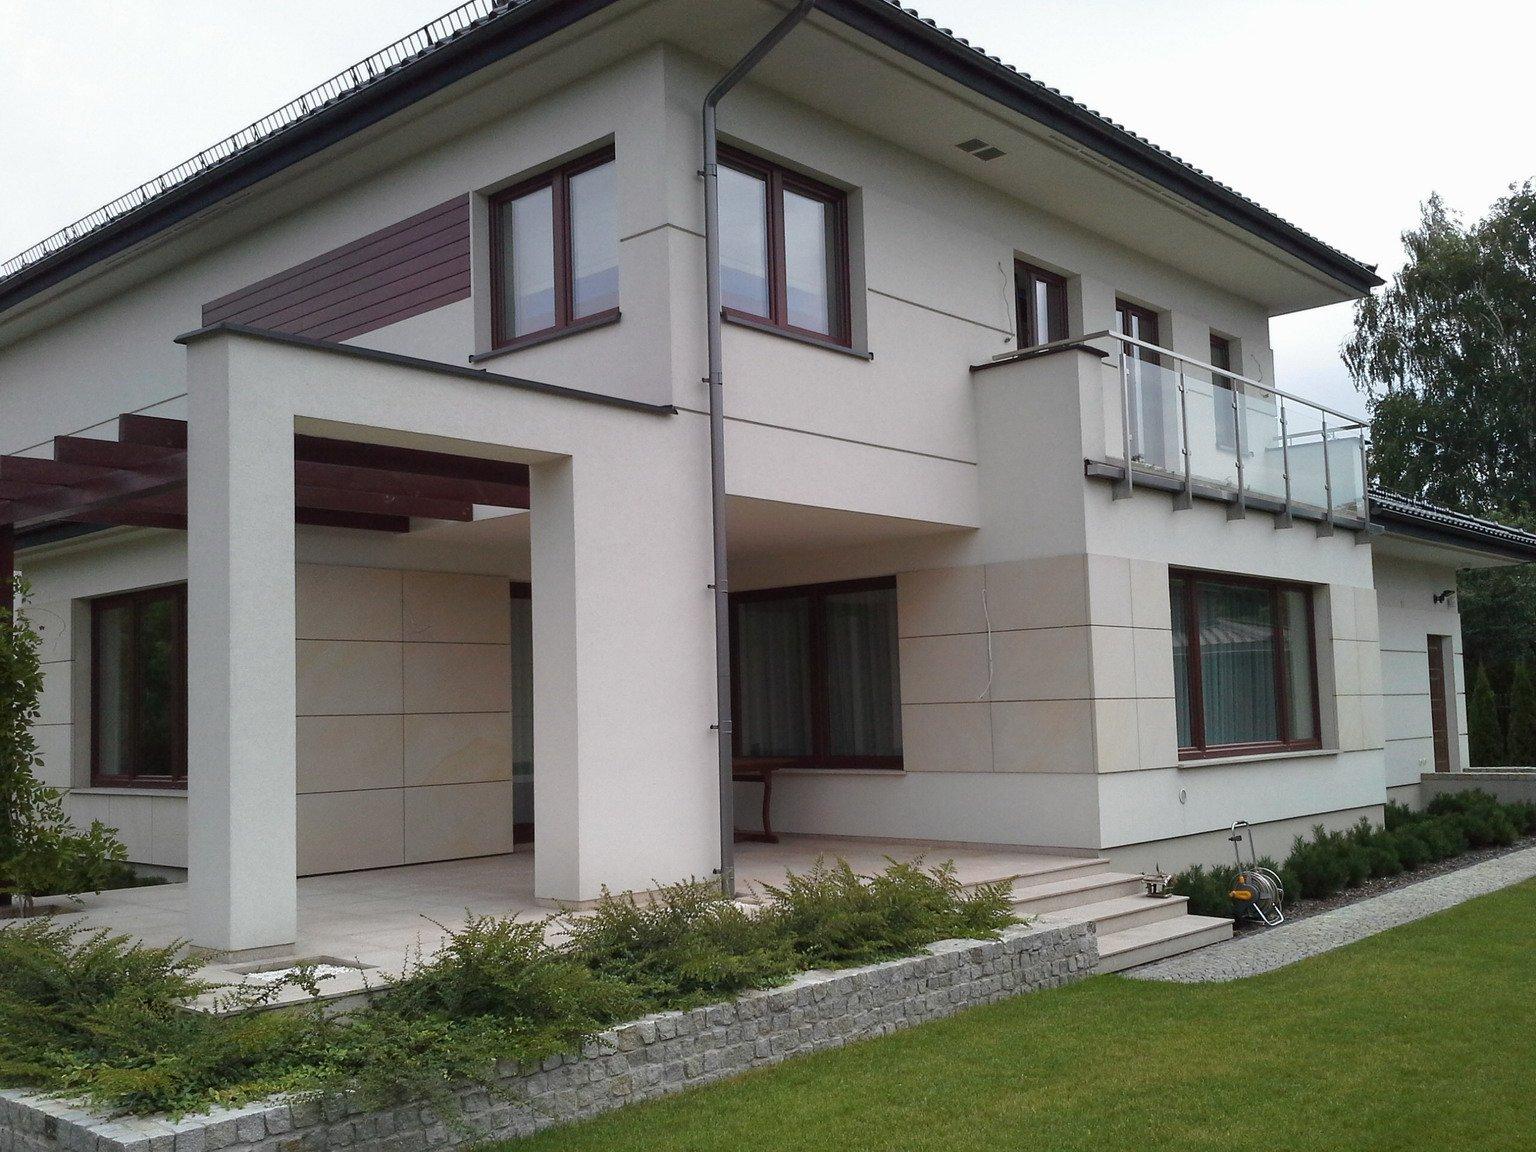 projekt-domu-slodki-fot-4-1382621978-c94i8146.jpg